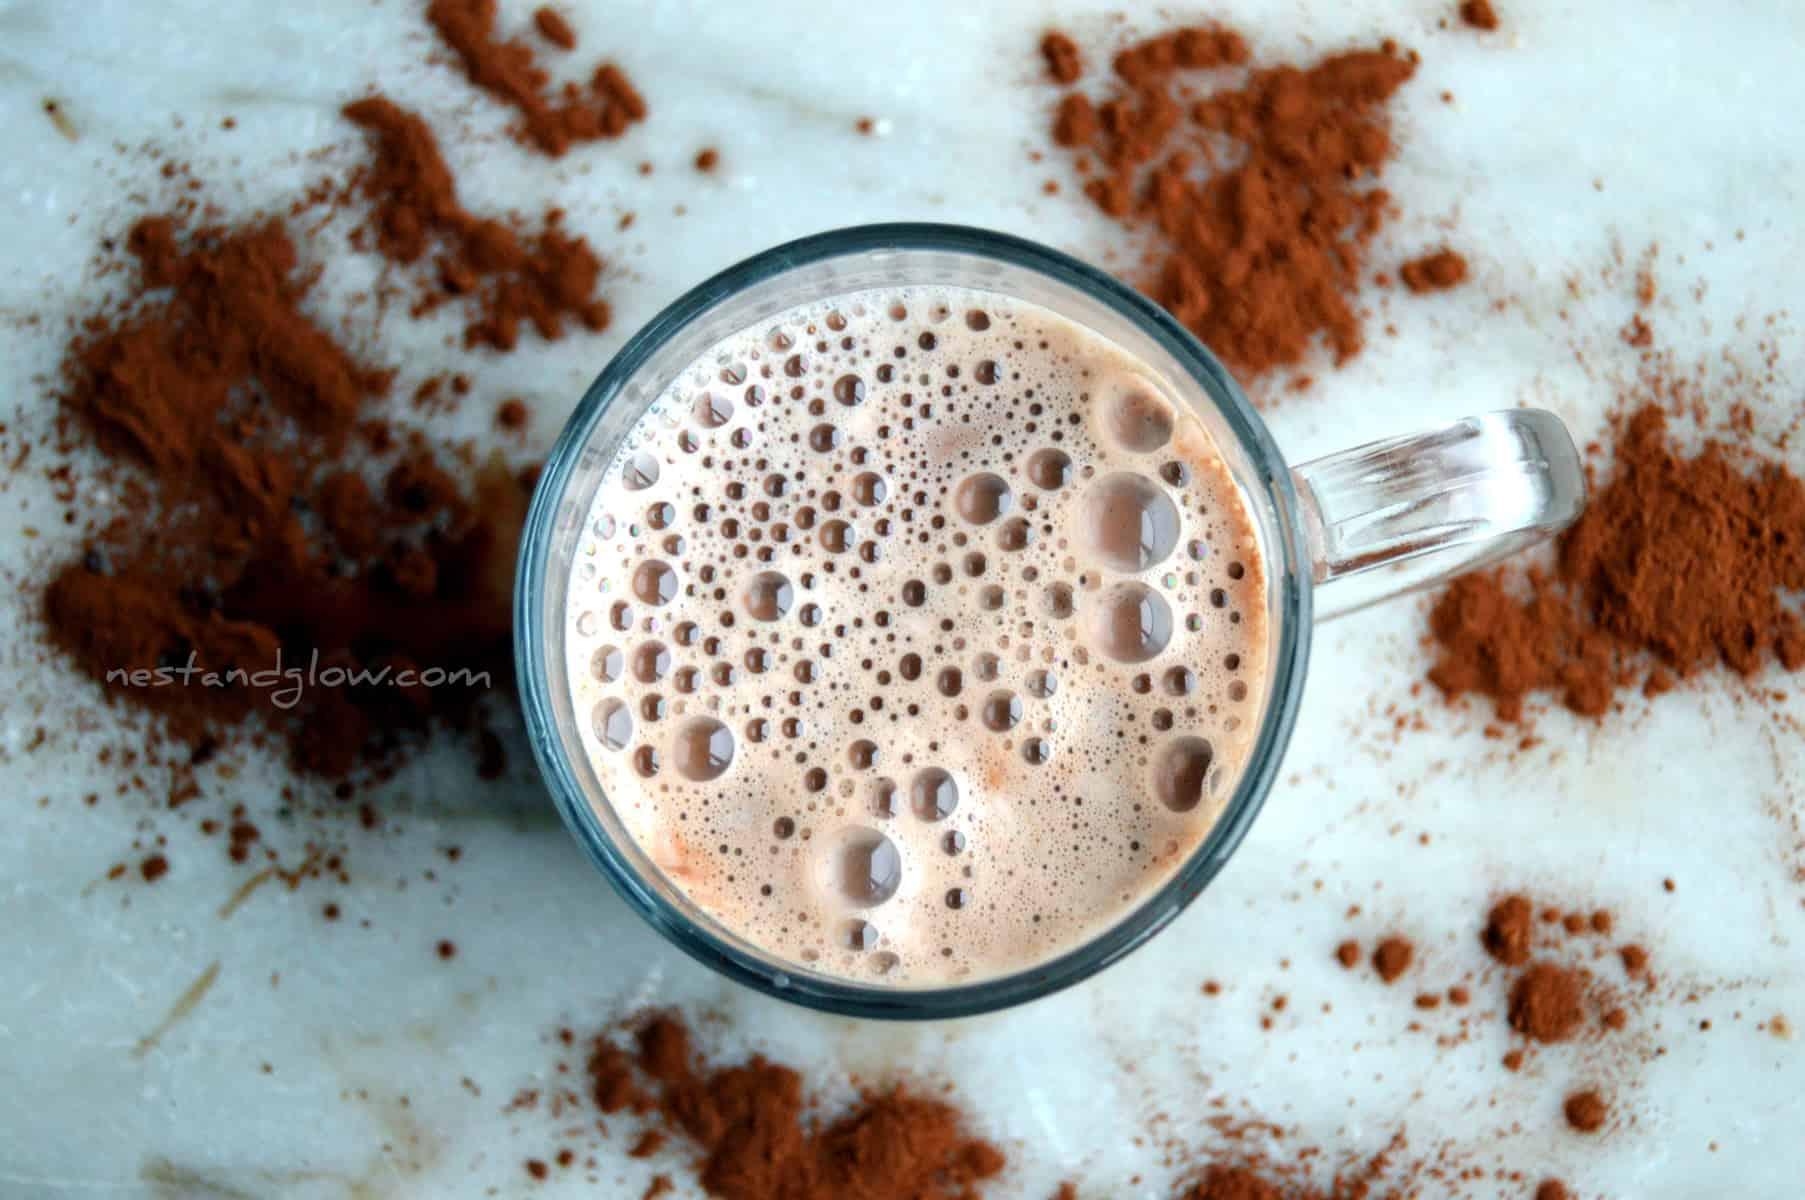 Raw Dairy Free Hot Chocolate Recipe - Nest and Glow